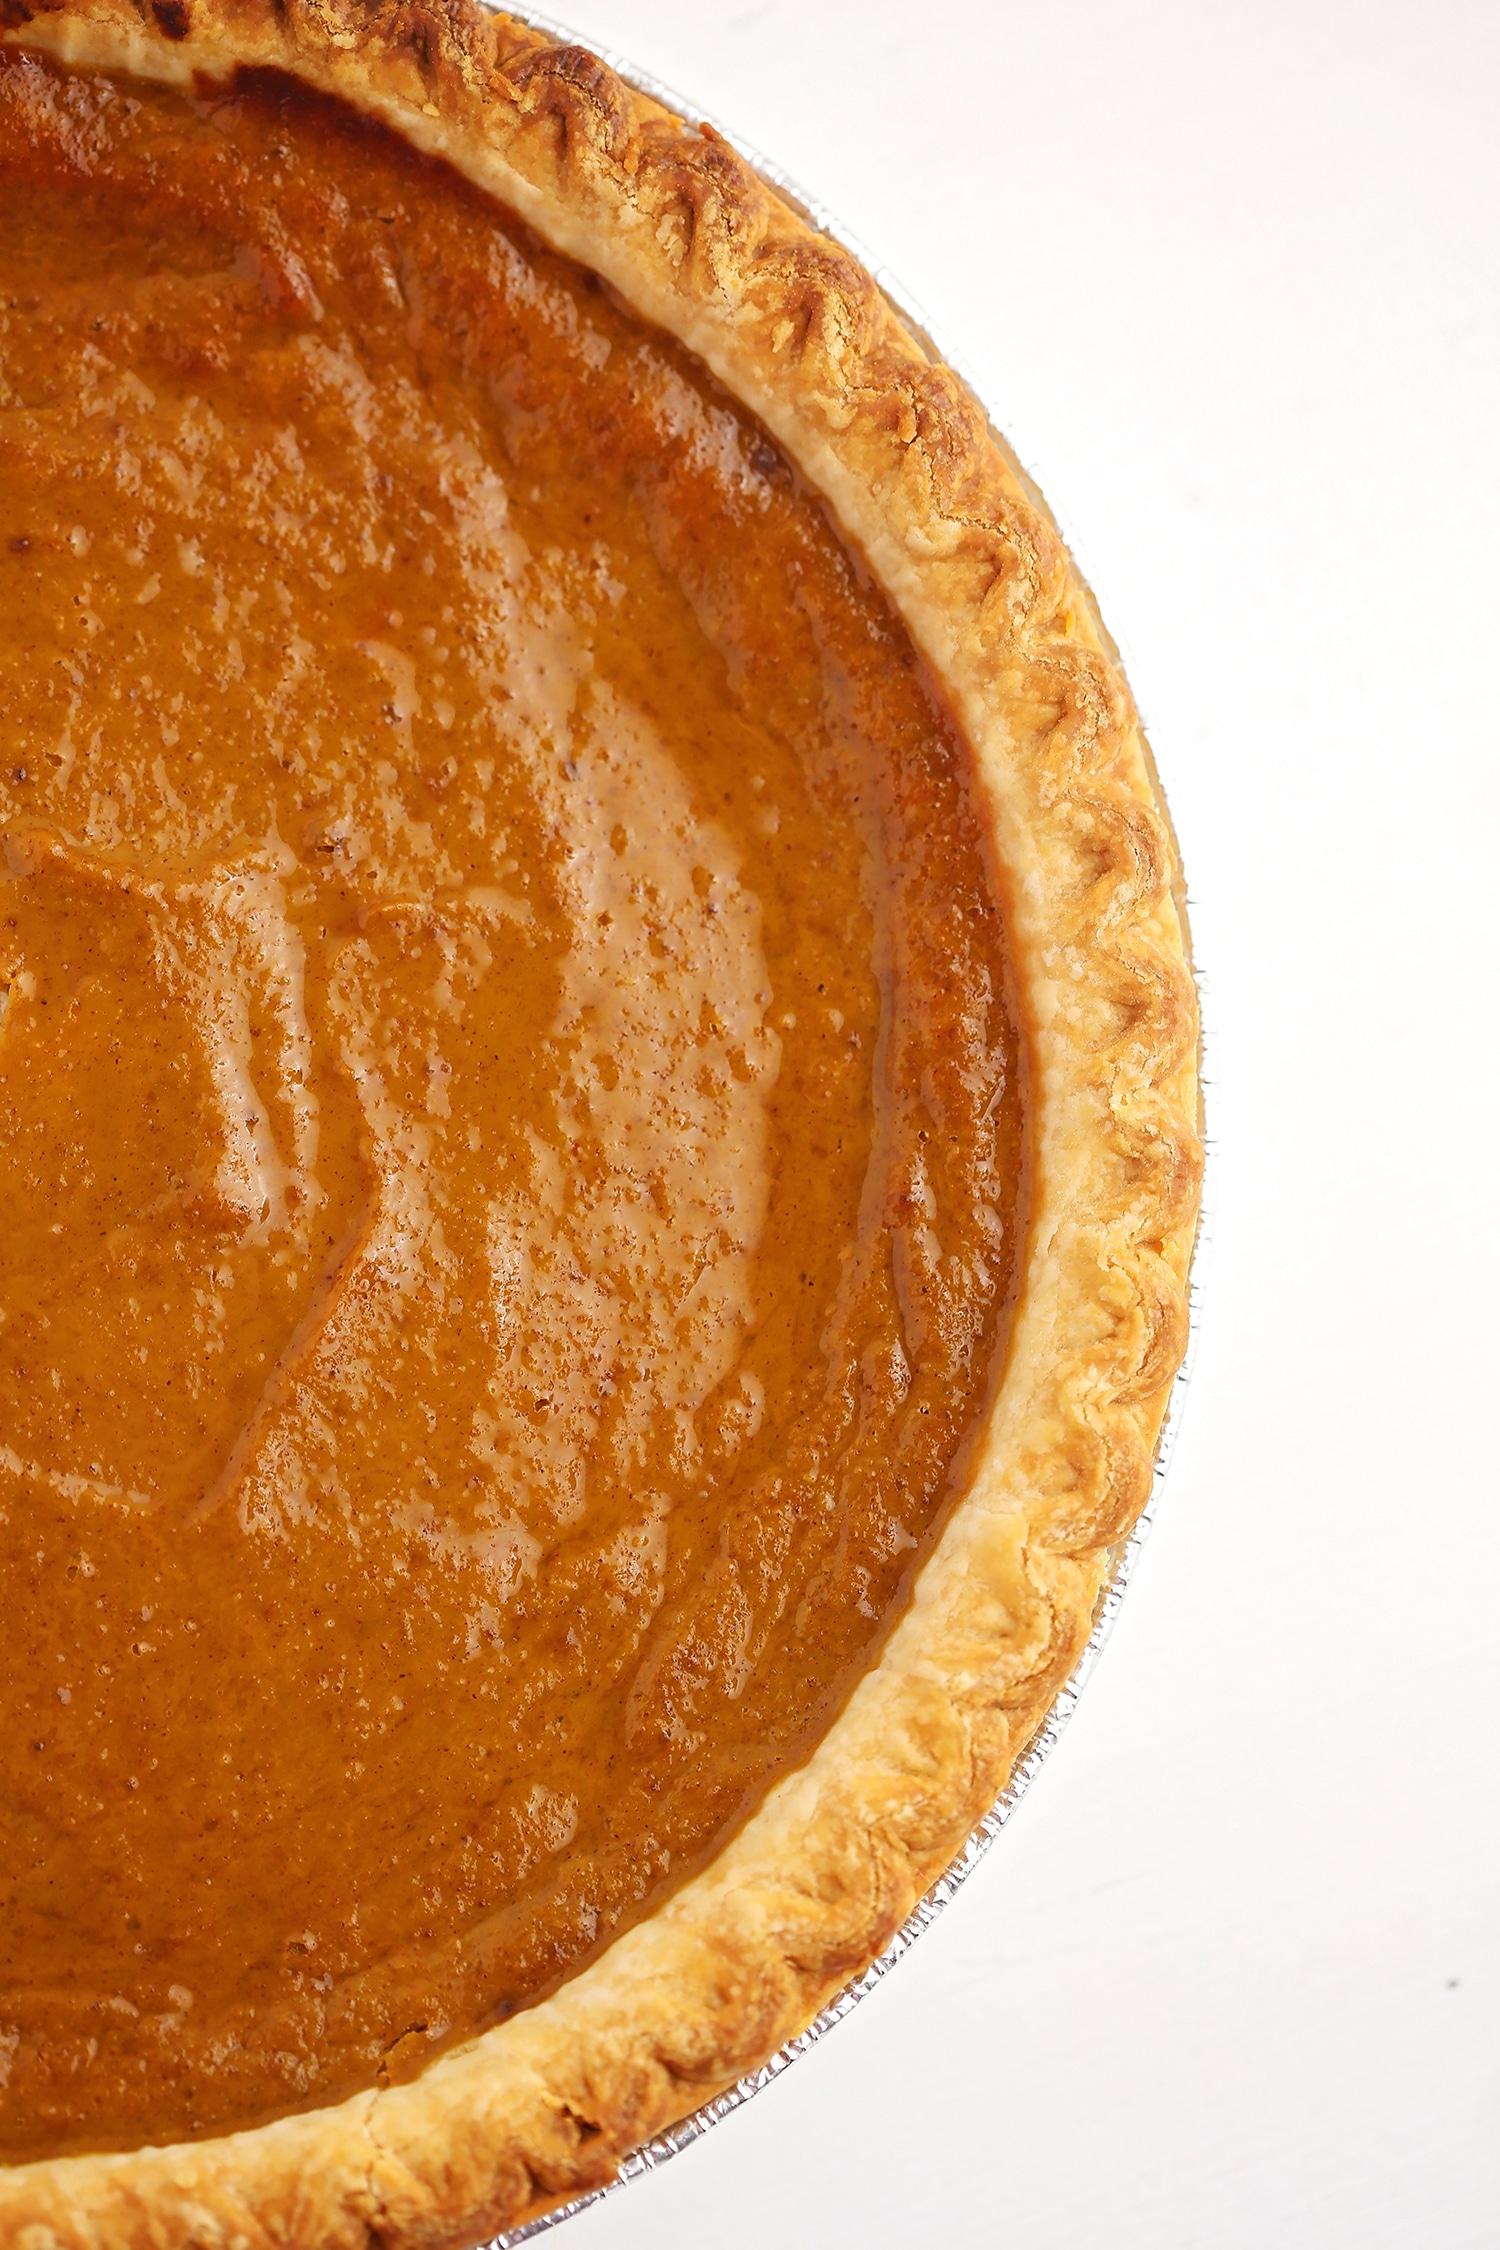 freshly baked pie in the pie dish